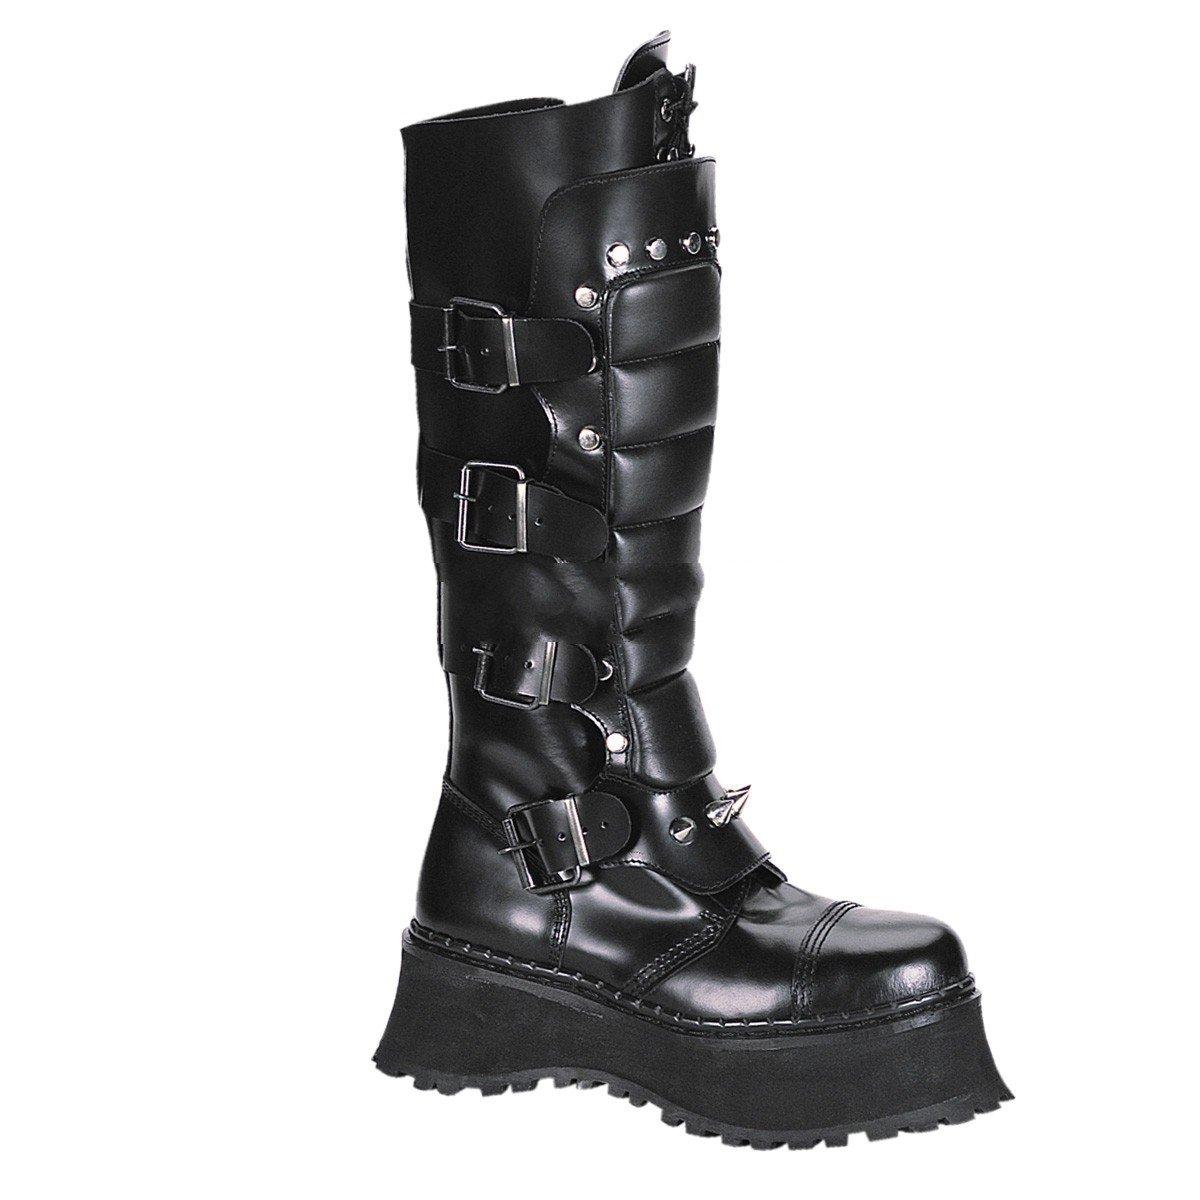 Demonia Ravage-II - Gothic Punk Industrial Industrial Industrial Ranger Stiefel Stiefel Schuhe 36-46 5e7812